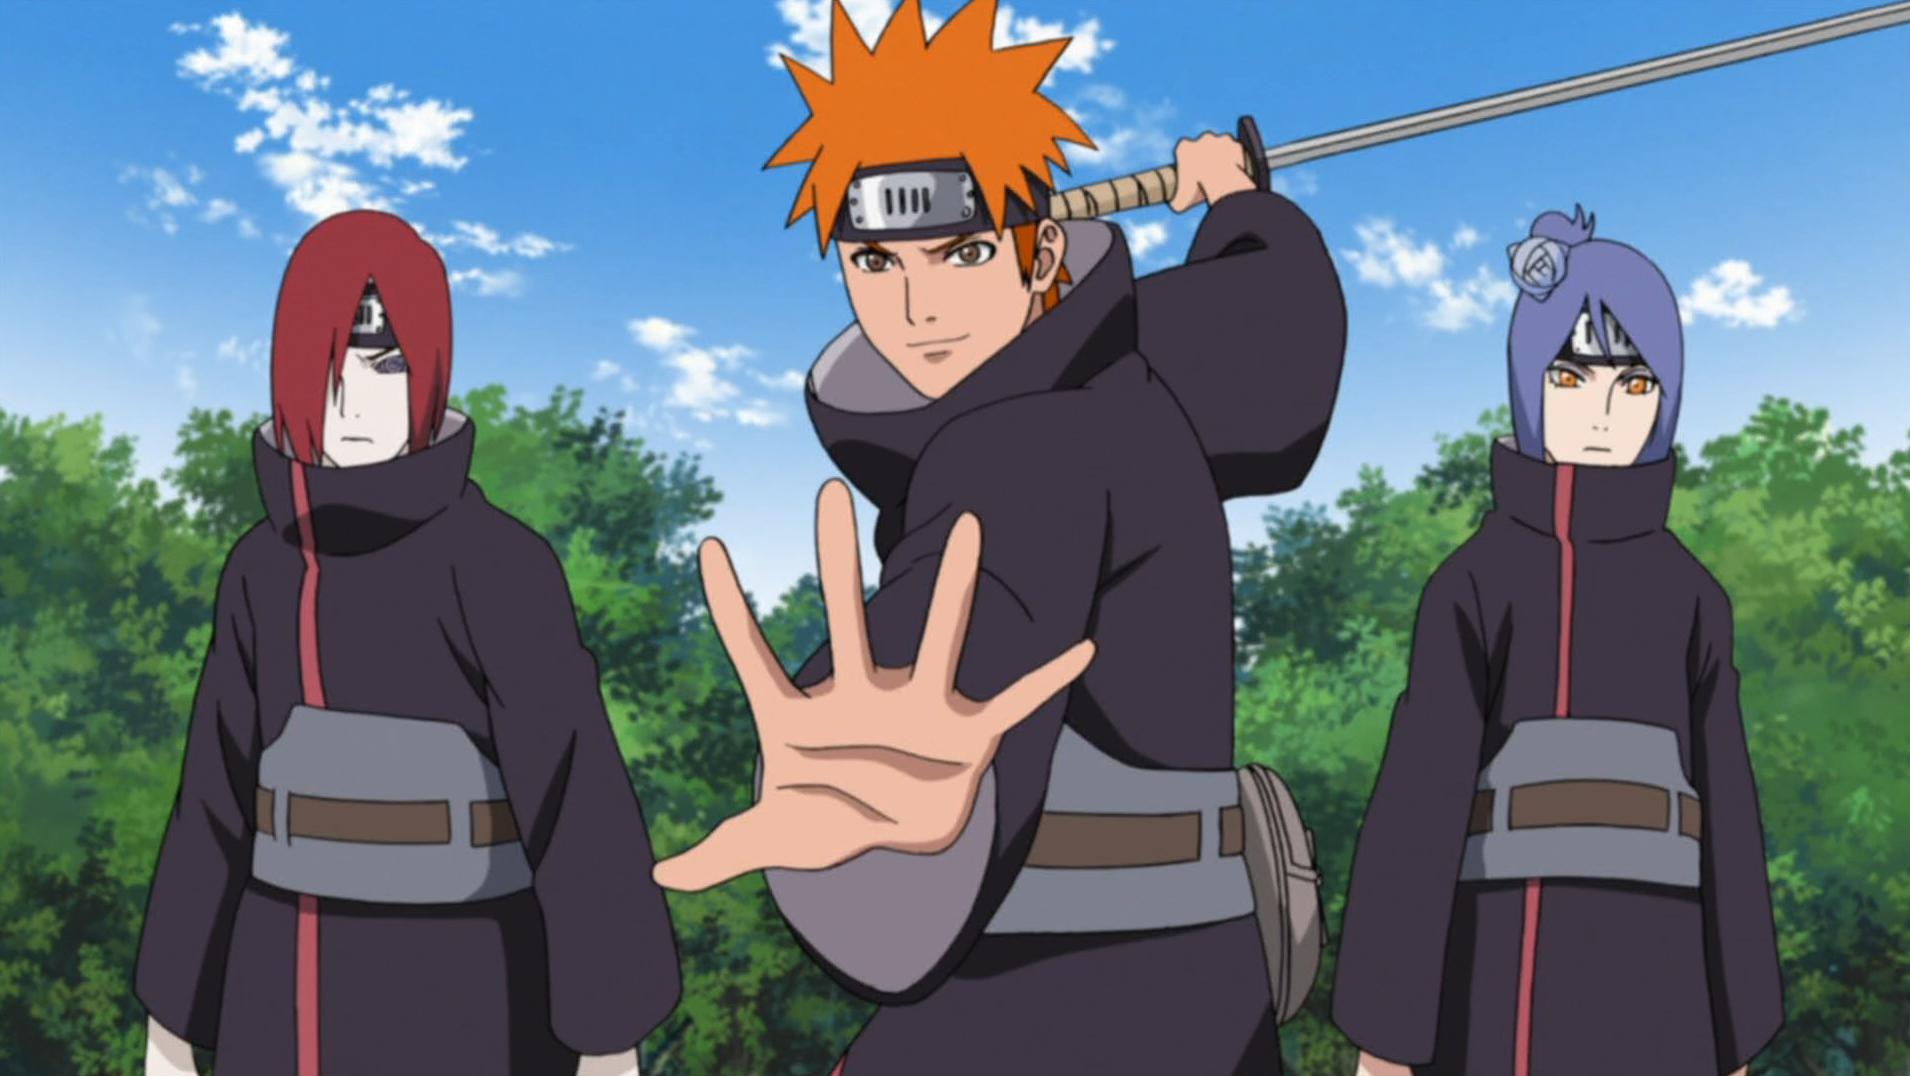 Carnets ninjas de Jiraya - Légendes du héros Naruto - L'Équipe de Jiraya